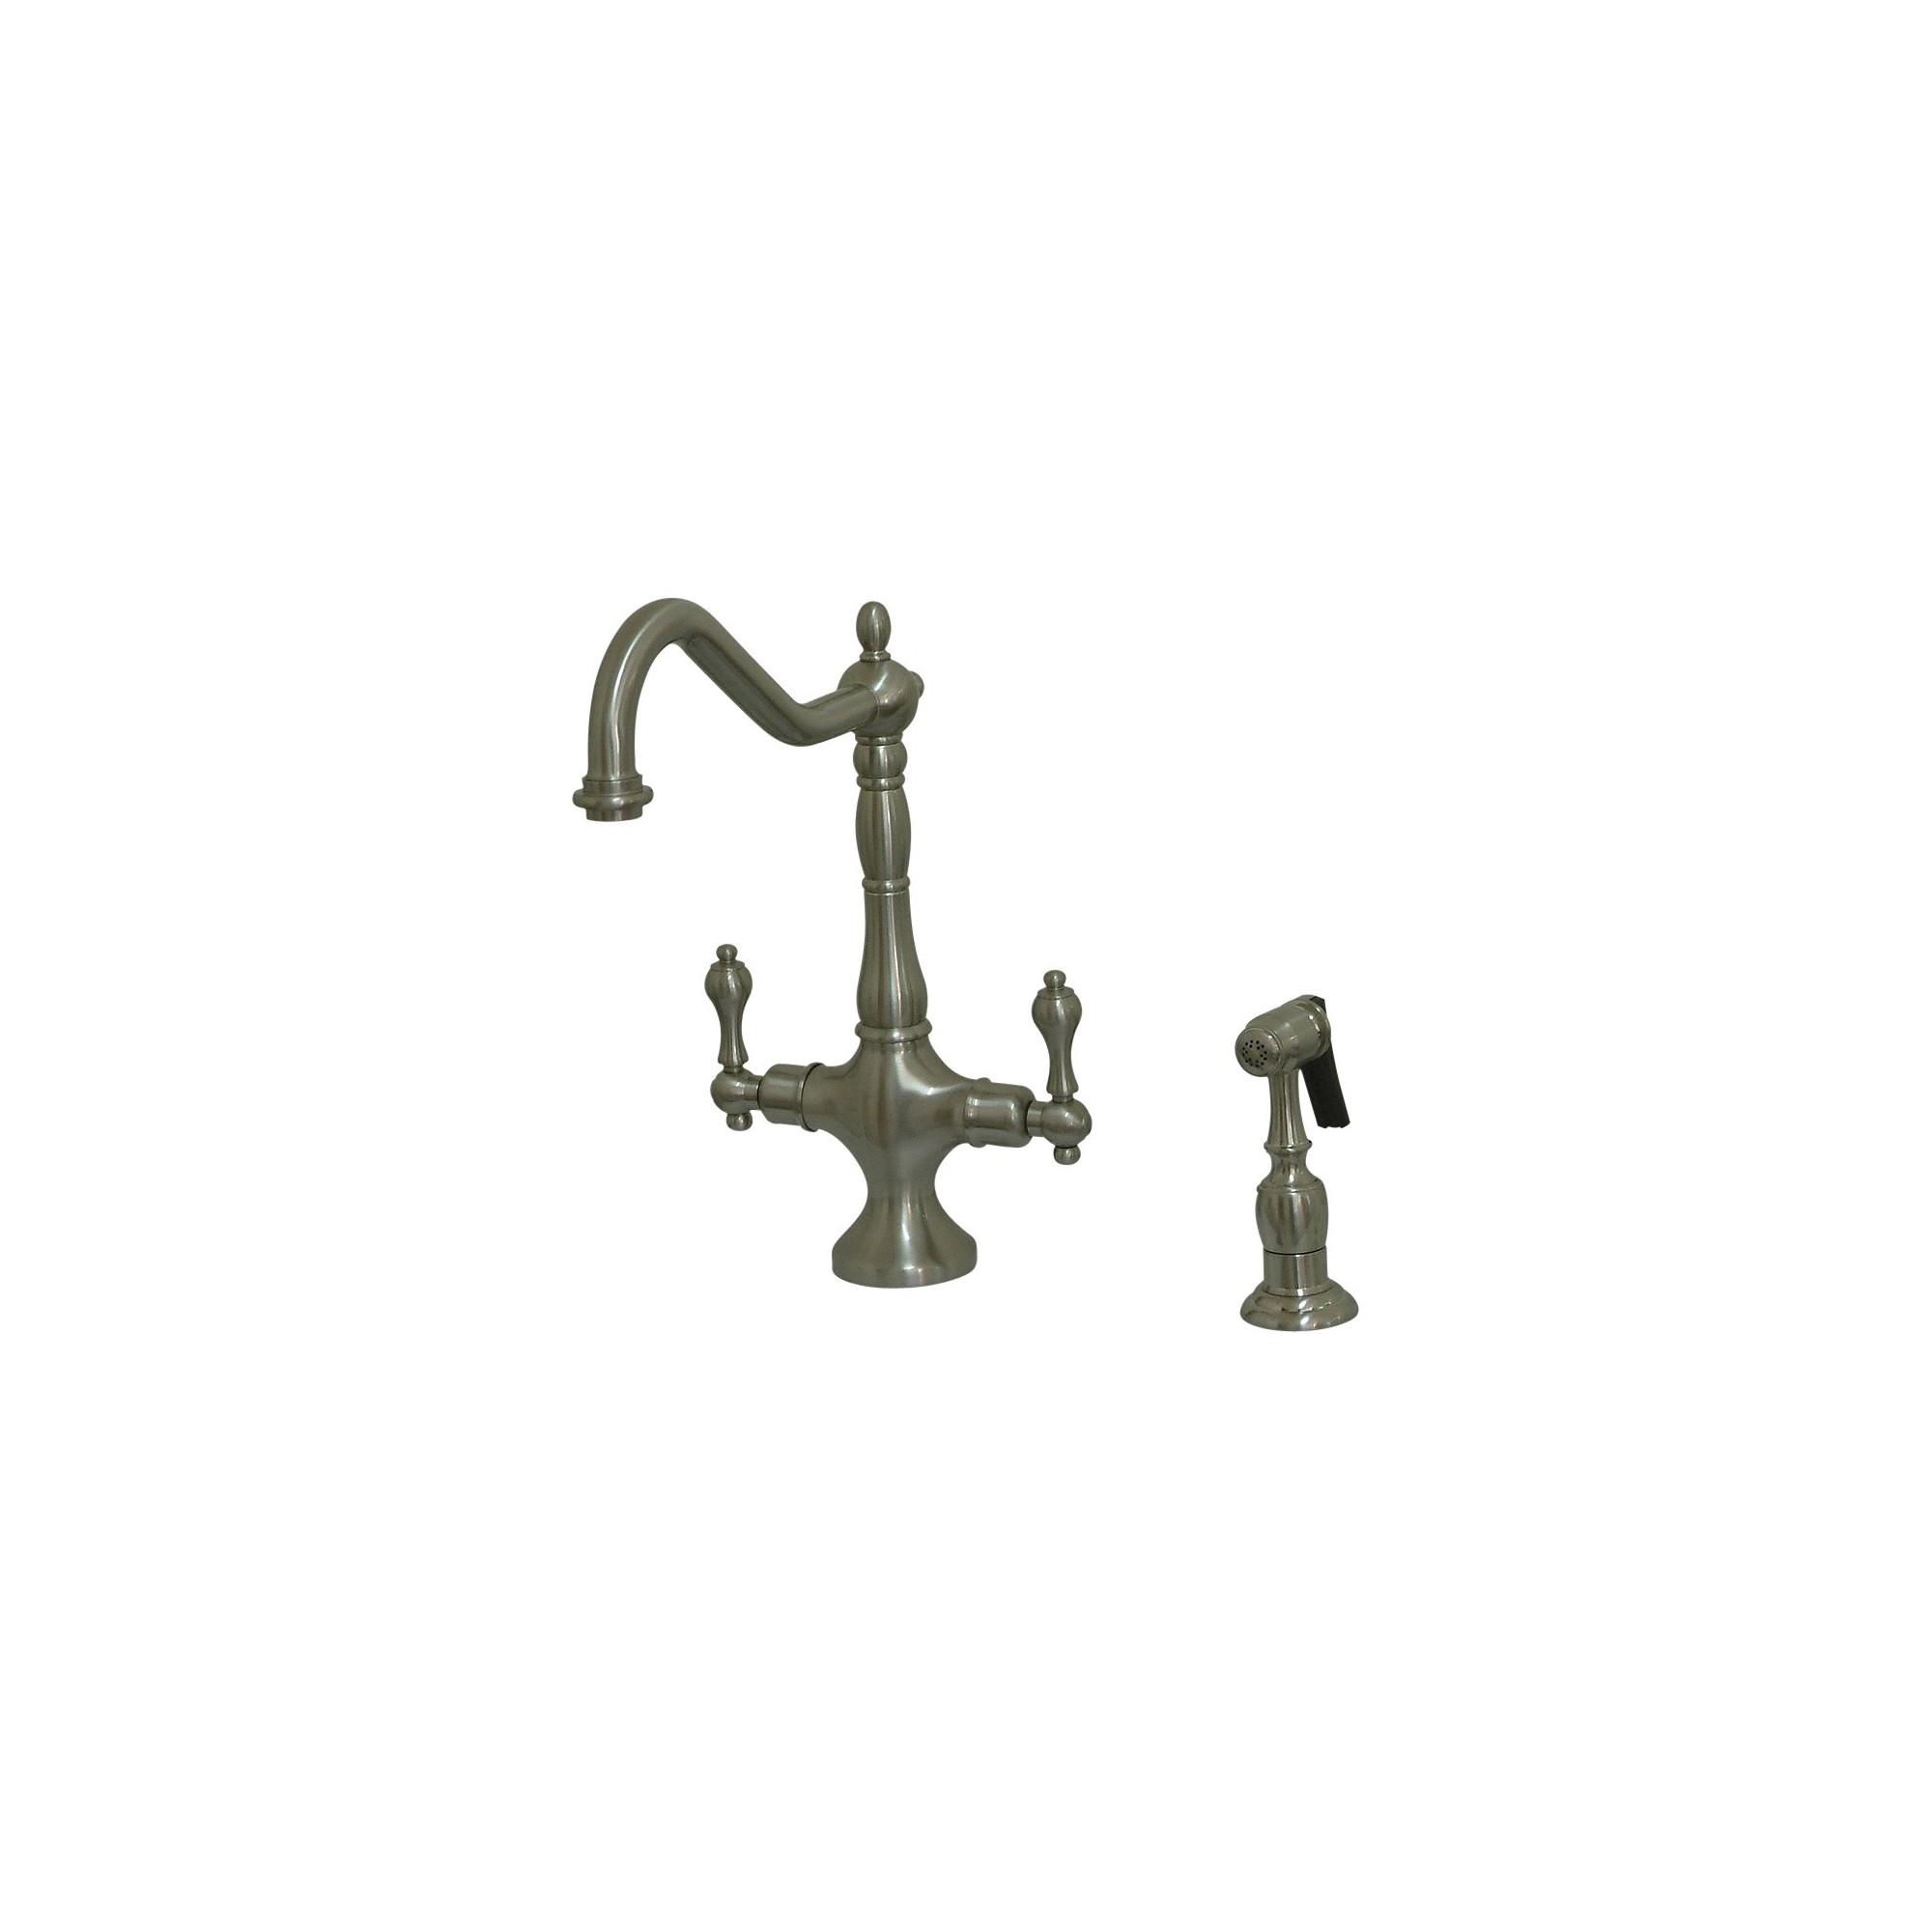 Satin Nickel Heritage Kitchen Faucet with Solid Brass Side Sprayer Satin Nickel - Kingston Brass